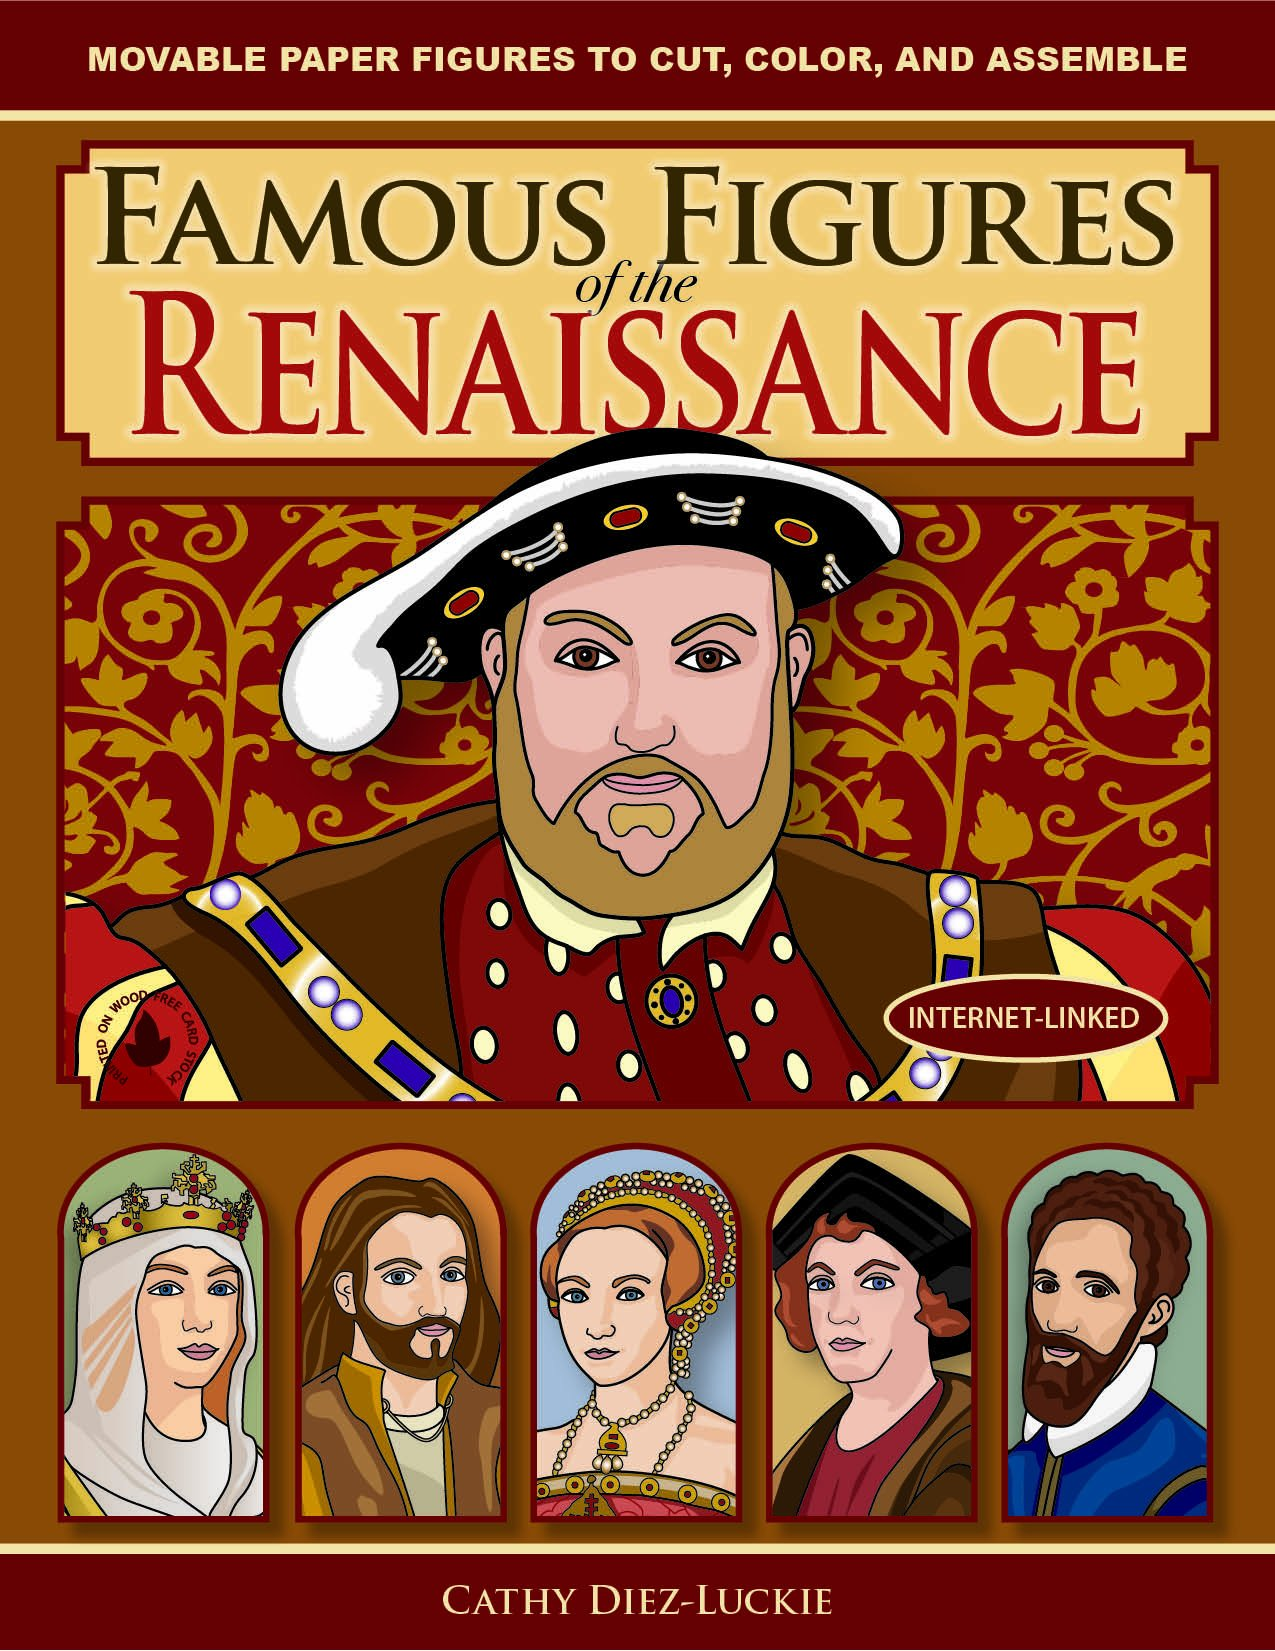 Read Online Famous Figures of the Renaissance: Movable Paper Figures to Cut, Color, and Assemble PDF